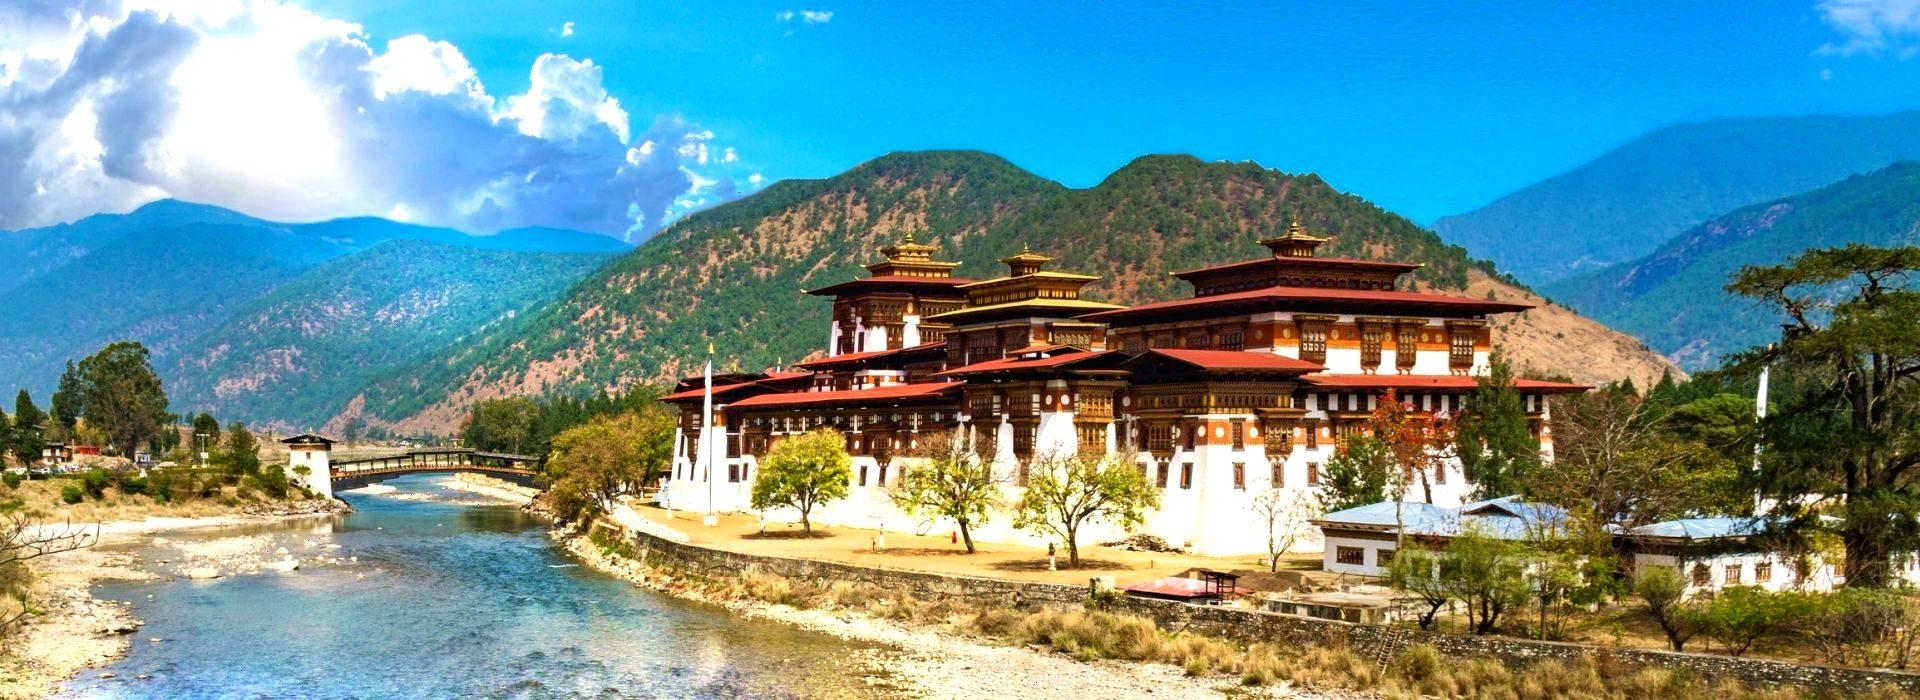 Mystical Bhutan tour – 6 Nights / 7 Days